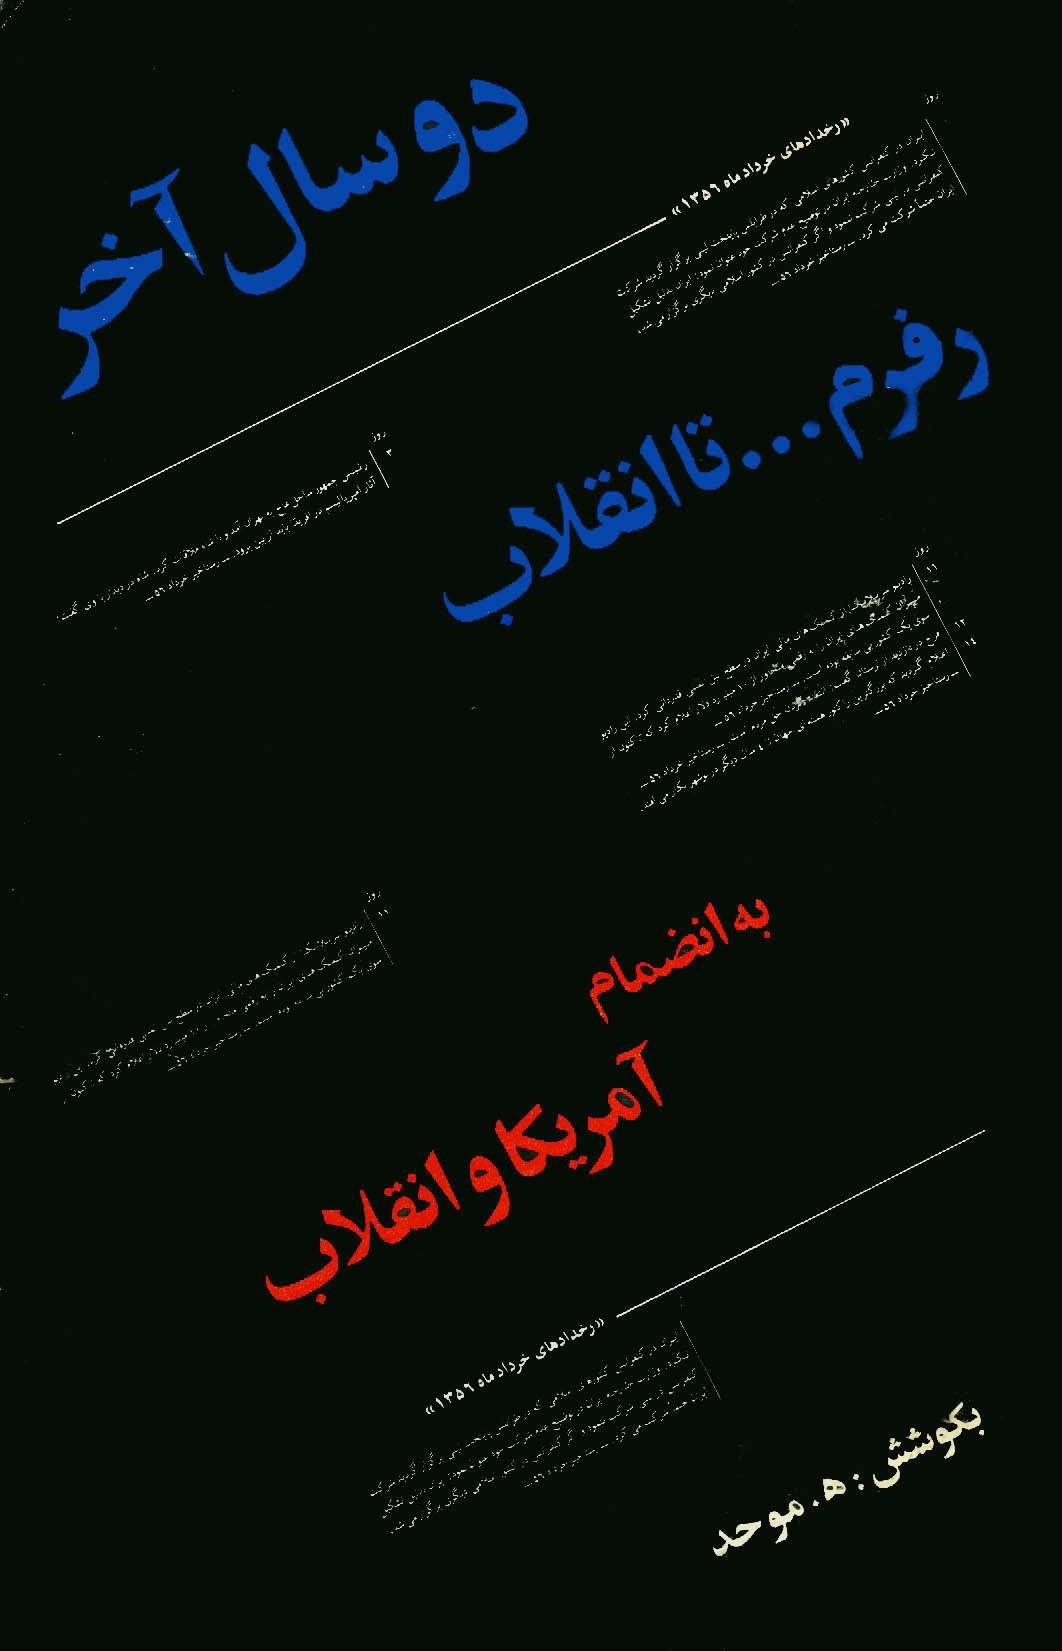 «دو سال آخر: رفرم ... تا انقلاب»